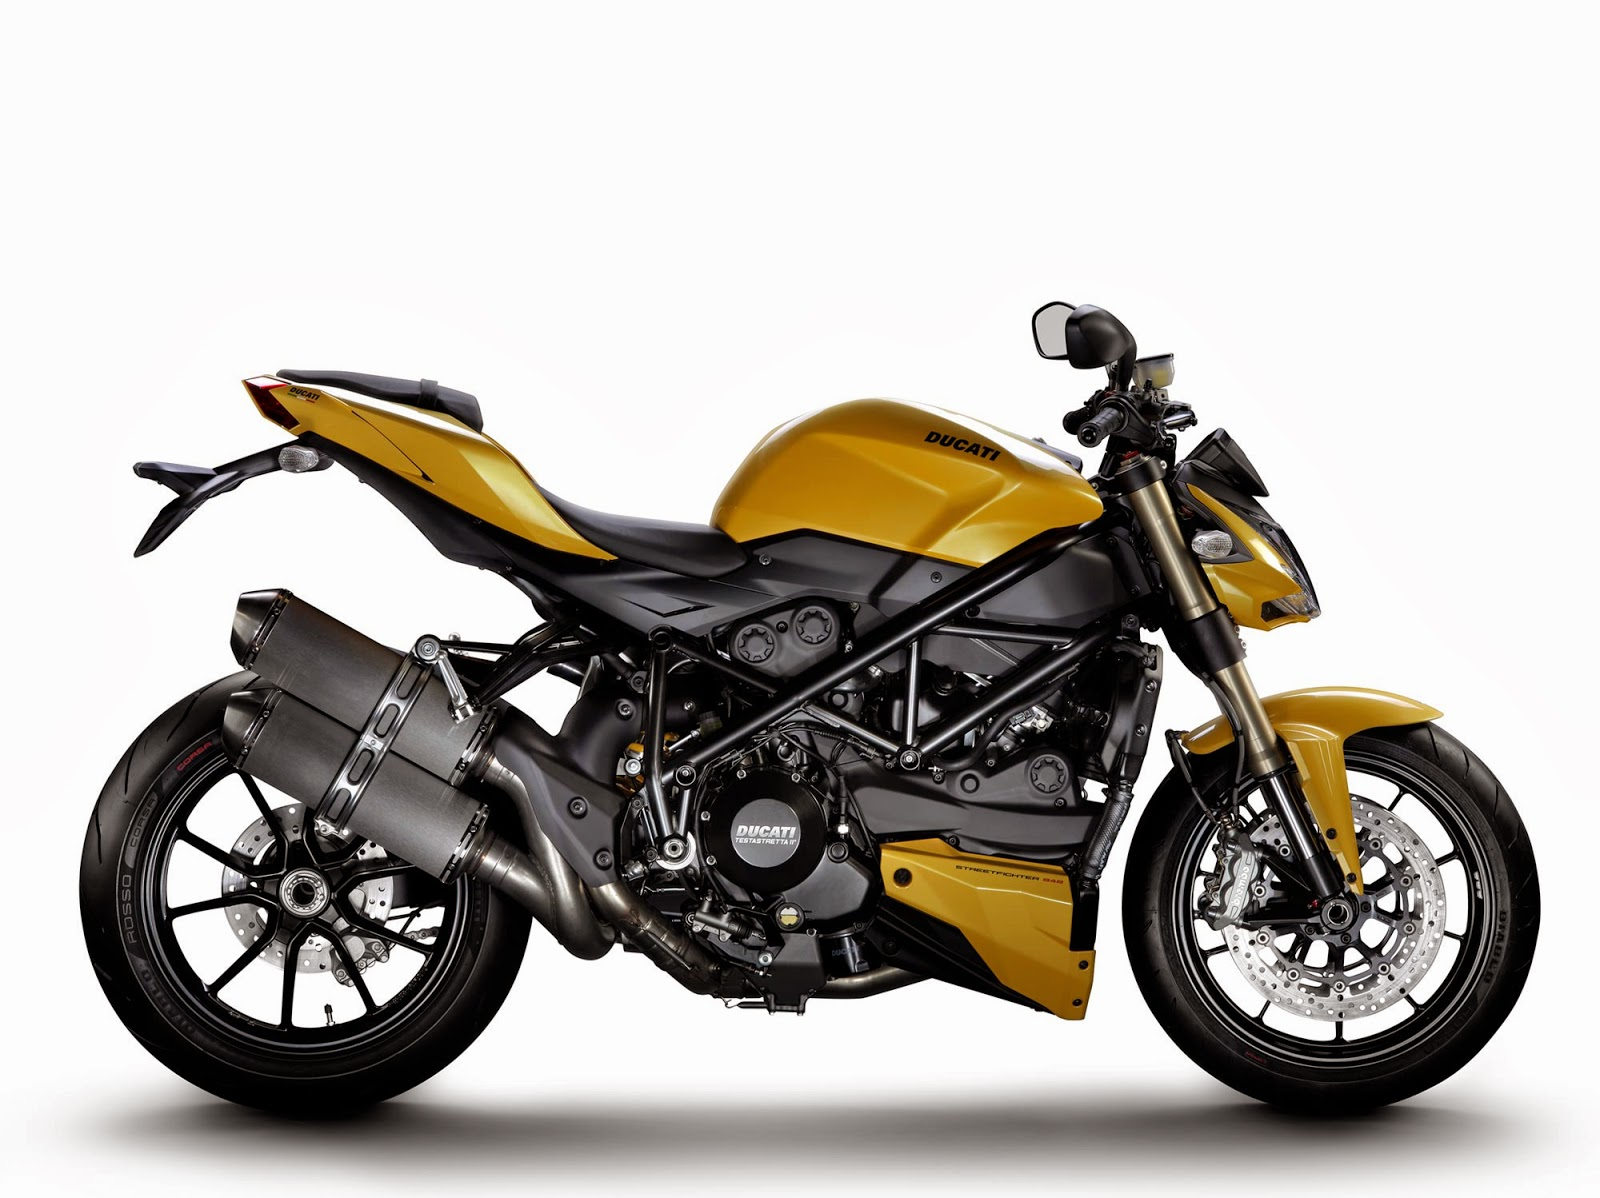 Ducati Streetfighter 848 - Giá: 33,000 usd